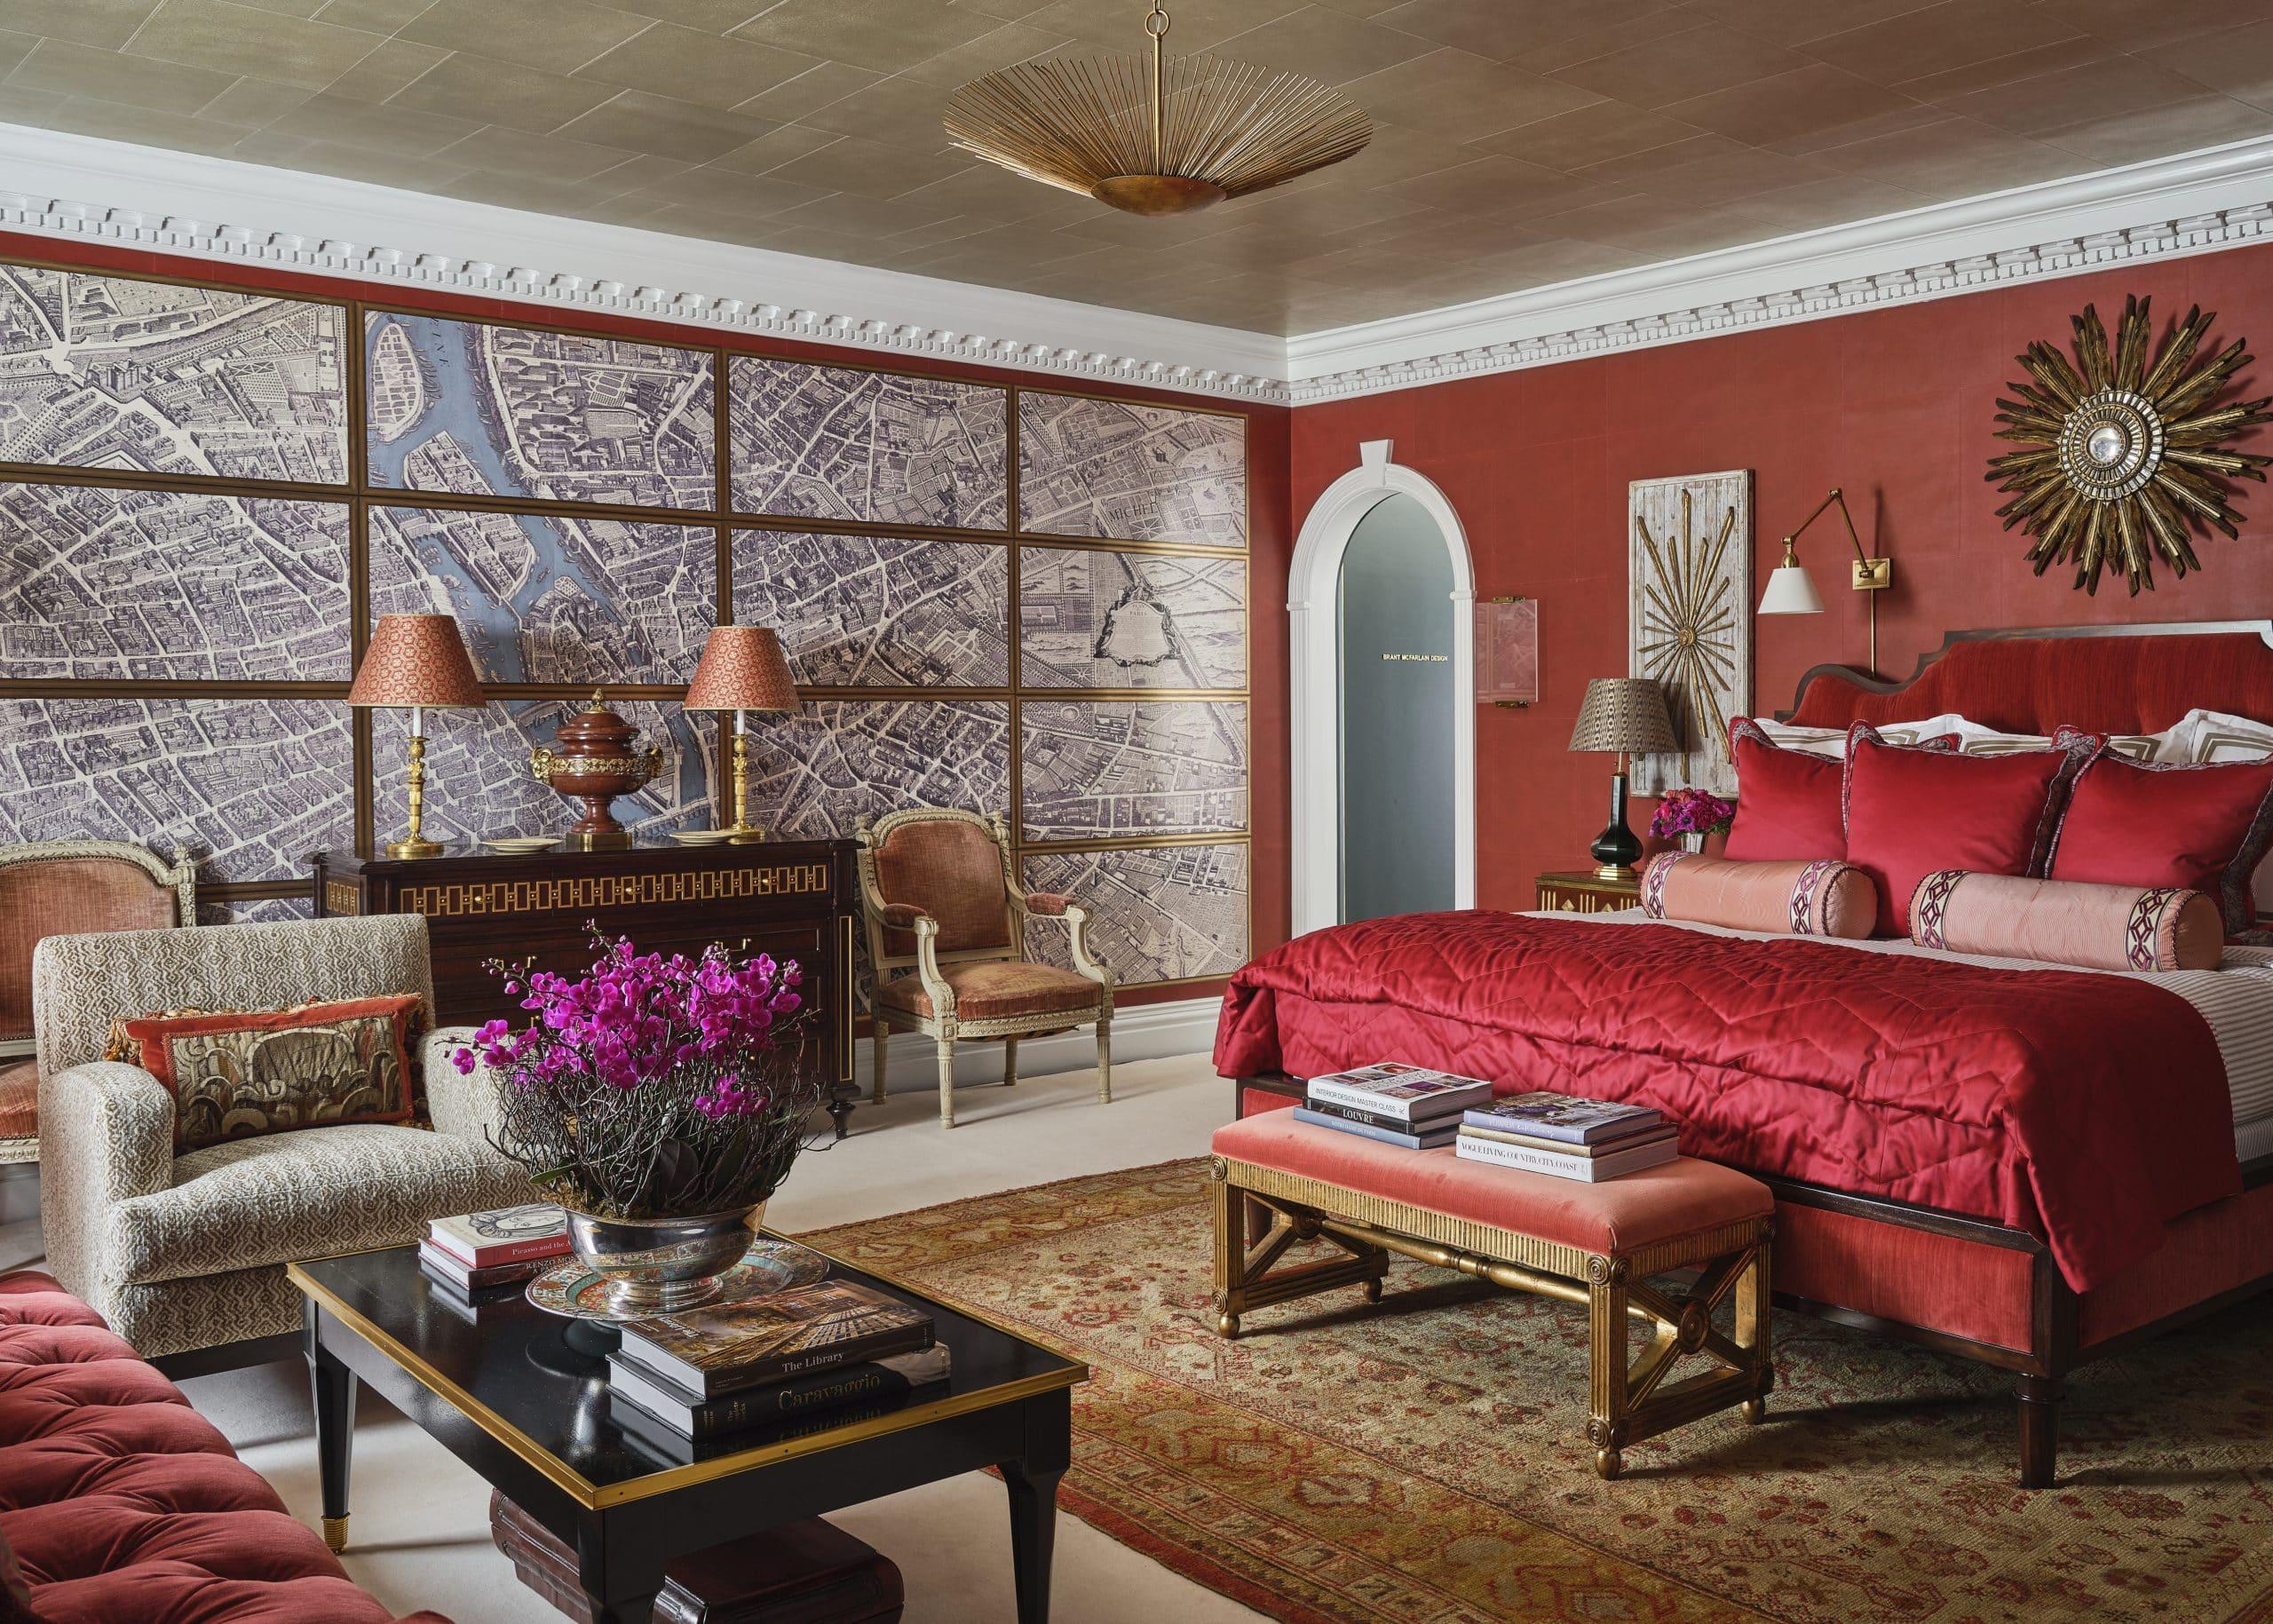 Bedroom designed by Mark Hampton LLC